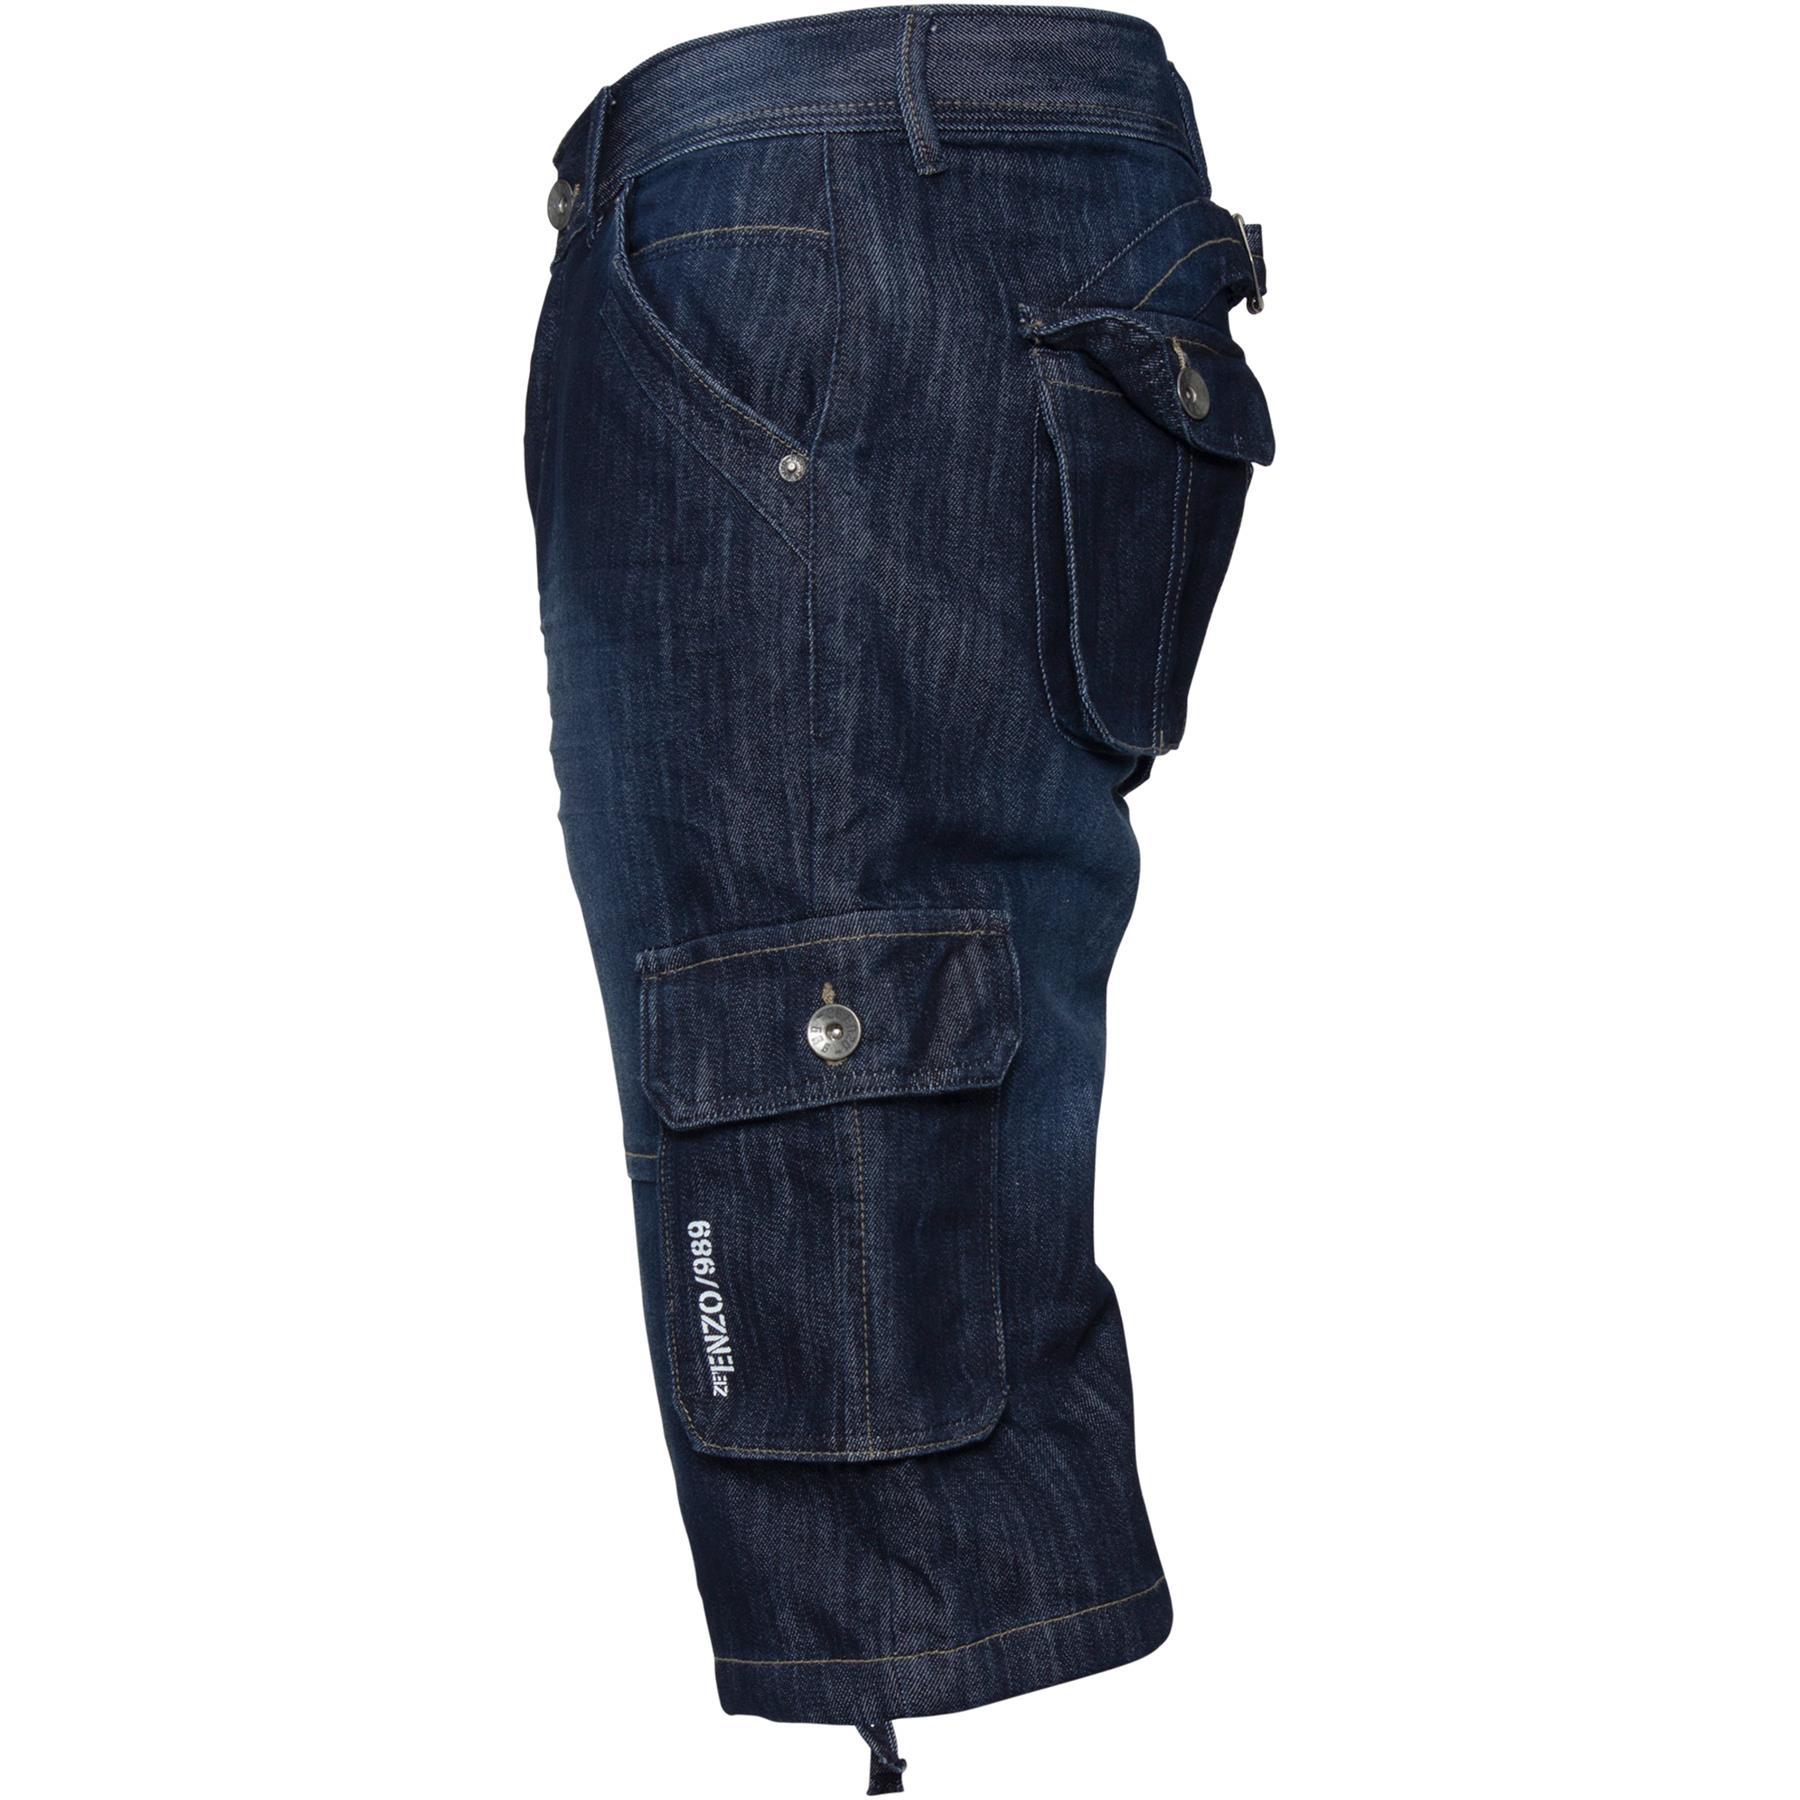 ENZO-Jeans-para-hombre-de-carga-combate-informal-de-verano-Shorts-Pantalones-Cortos-de-Jeans-Todas miniatura 16